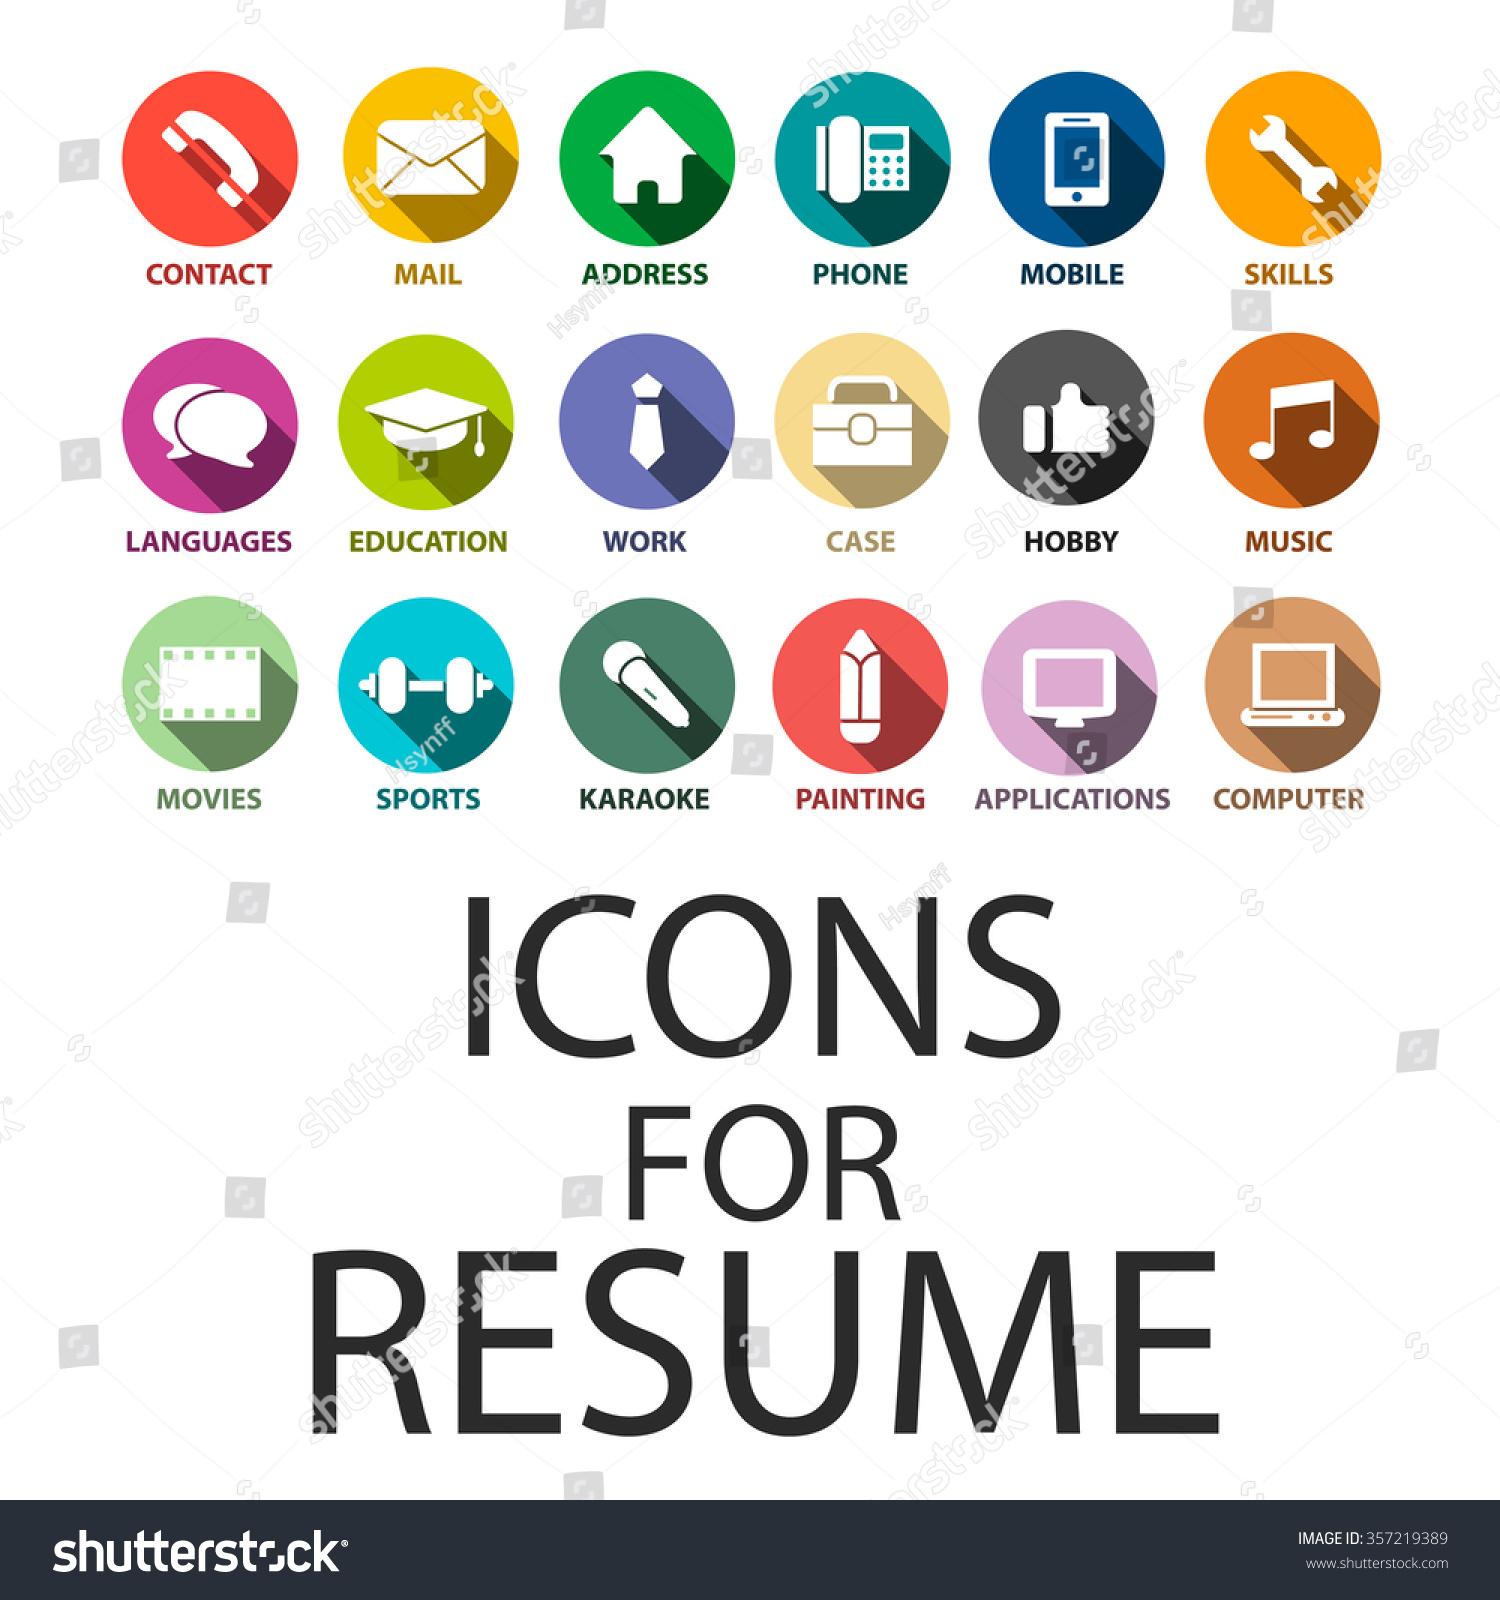 Resume symbols word - Device tester resume